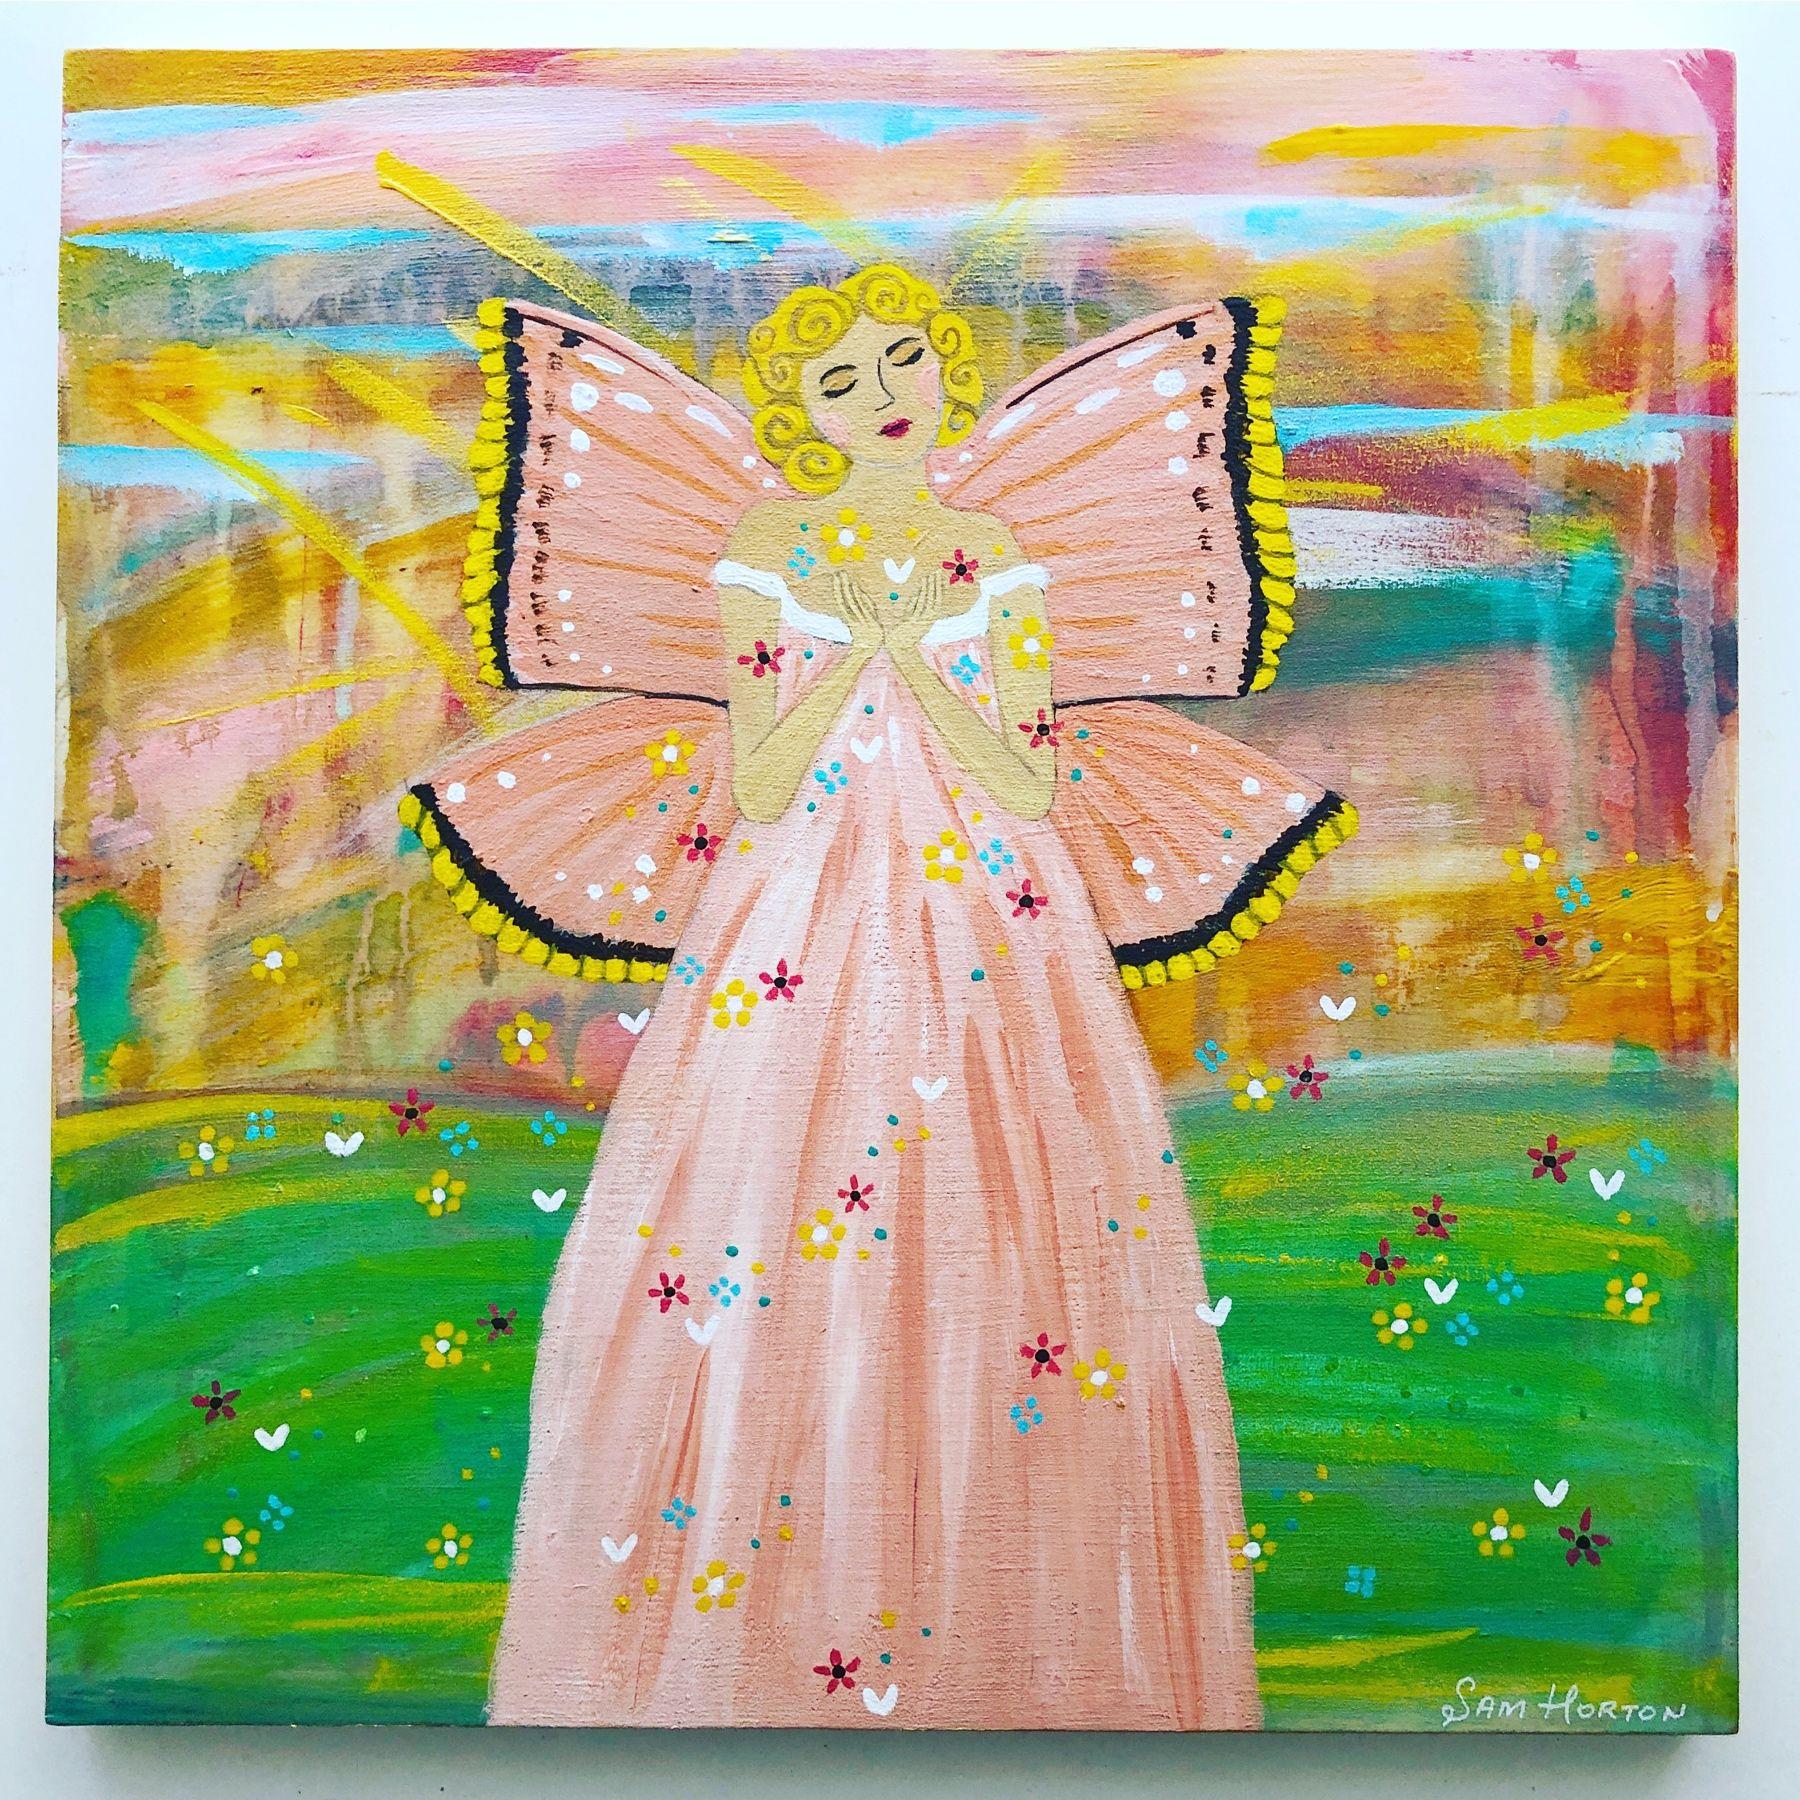 New Butterfly Lady Painting - 'Sunlit Angel' 💗☀️ Acrylic on 12 x 12 inch Wood Panel . . #Butterflyart #butterflygirl #butterflylady #acrylicpainting #acrycliconwood #angelpainting #whimsy #makebelieve #lovetopaint #aussieart #australianartist #creativeliving #creativelife #dowhatyoulove #trusttheuniverse #choosemust #abstractbackground #findyourflow #australianart #prettypainting #girlsart #girlsroomart #artexperiment #artpractice #doitfortheprocess #artflow #folkart #folkartist